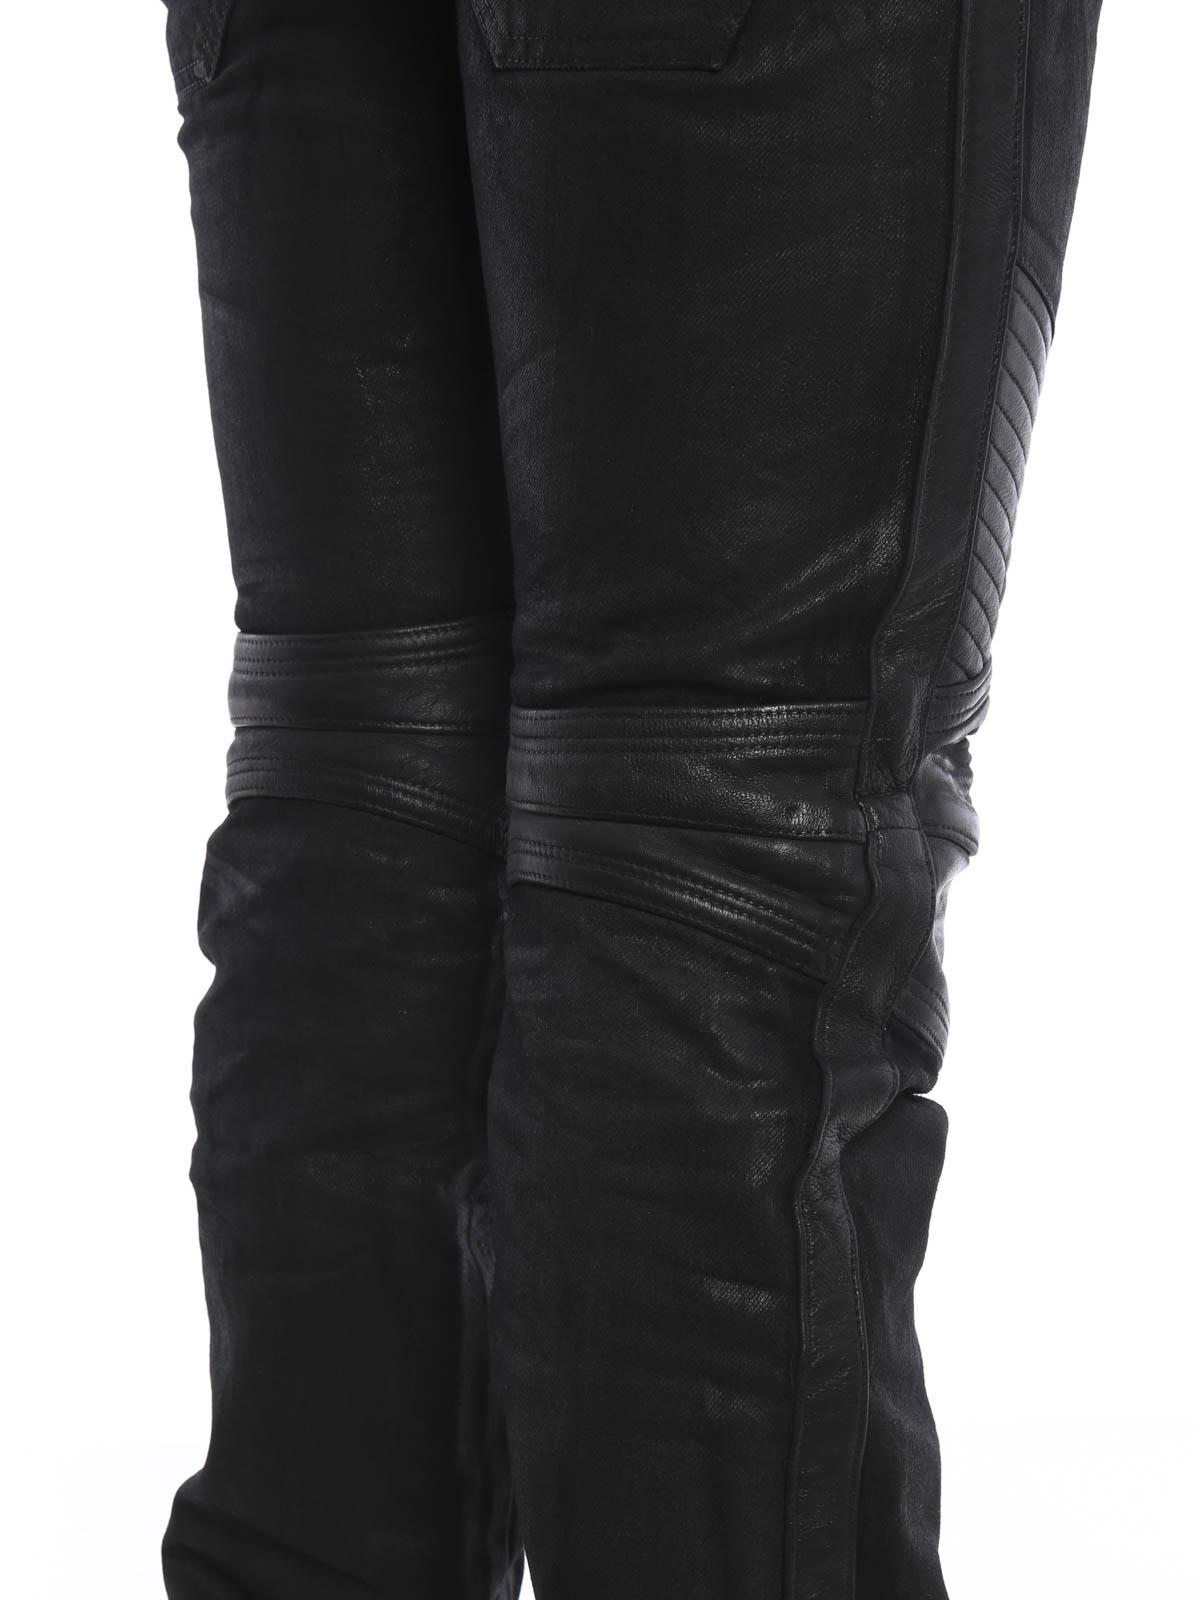 balmain lederhose fur herren schwarz lederhosen s6ht569d309c176. Black Bedroom Furniture Sets. Home Design Ideas